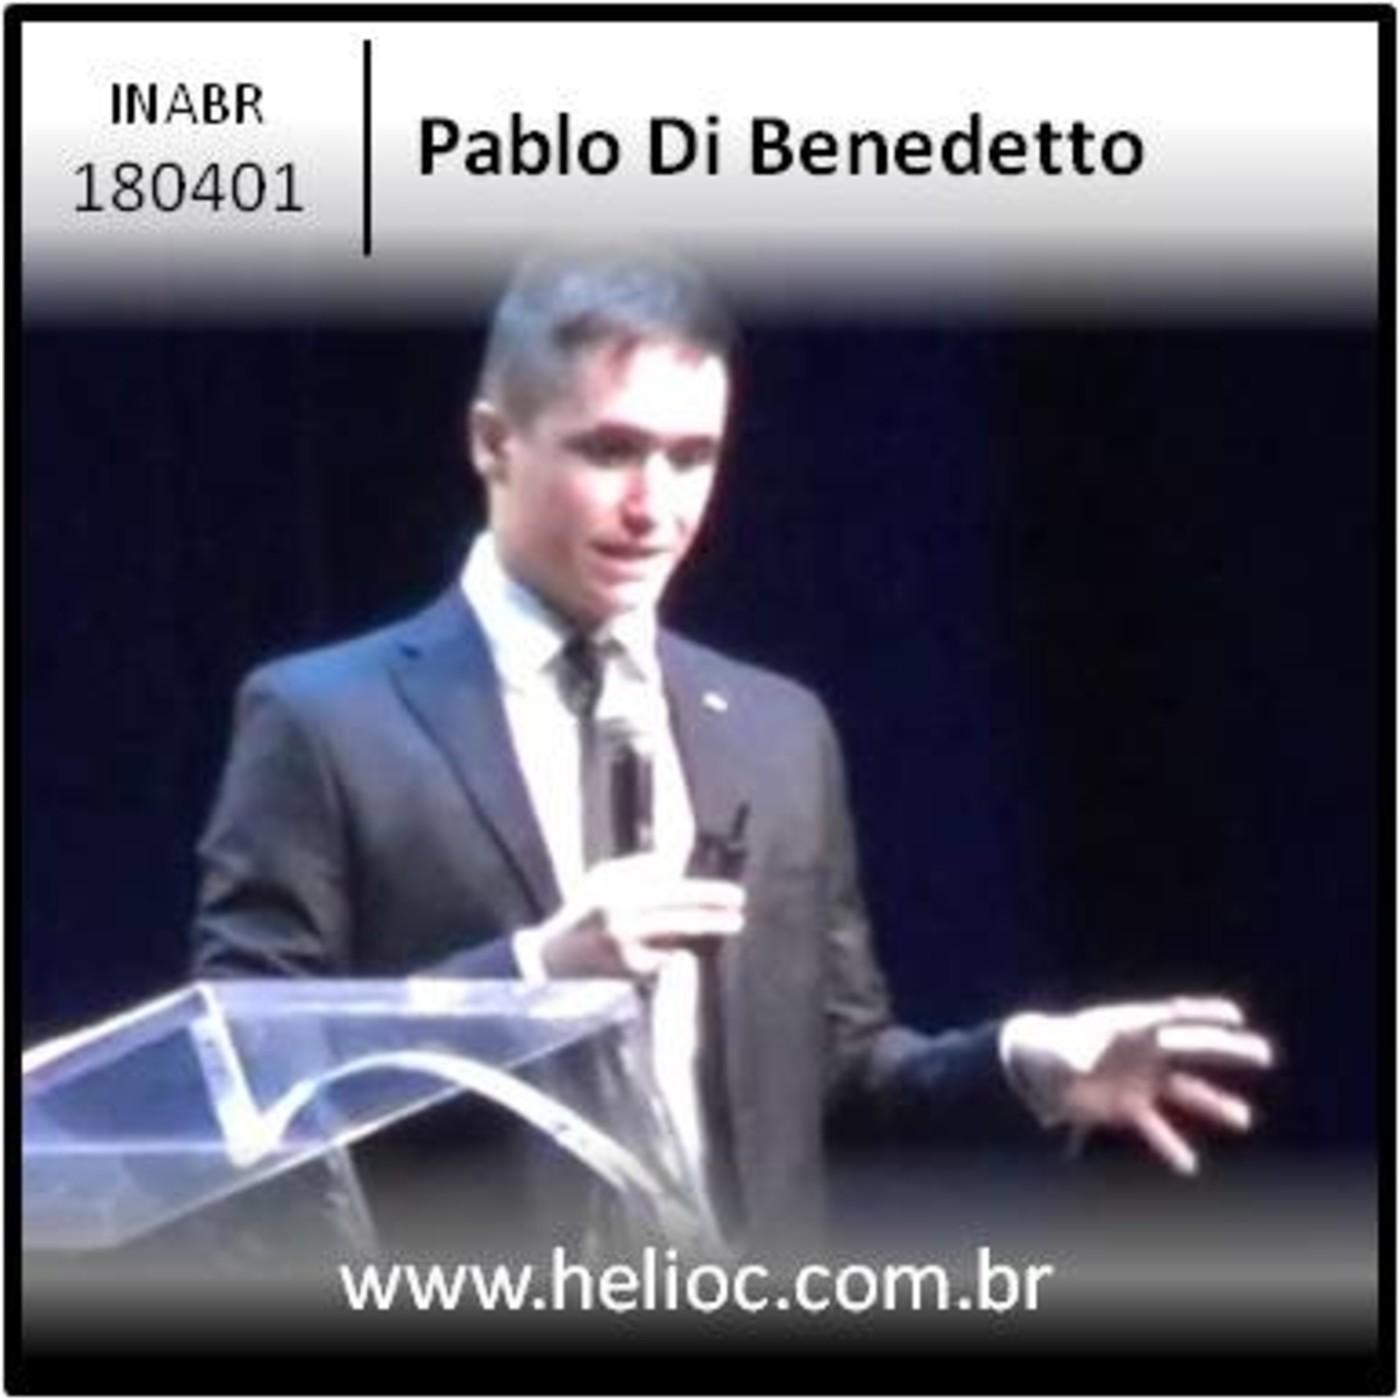 INABR 180401 - Tecnicas do Negocio - Pablo Di Benedetto